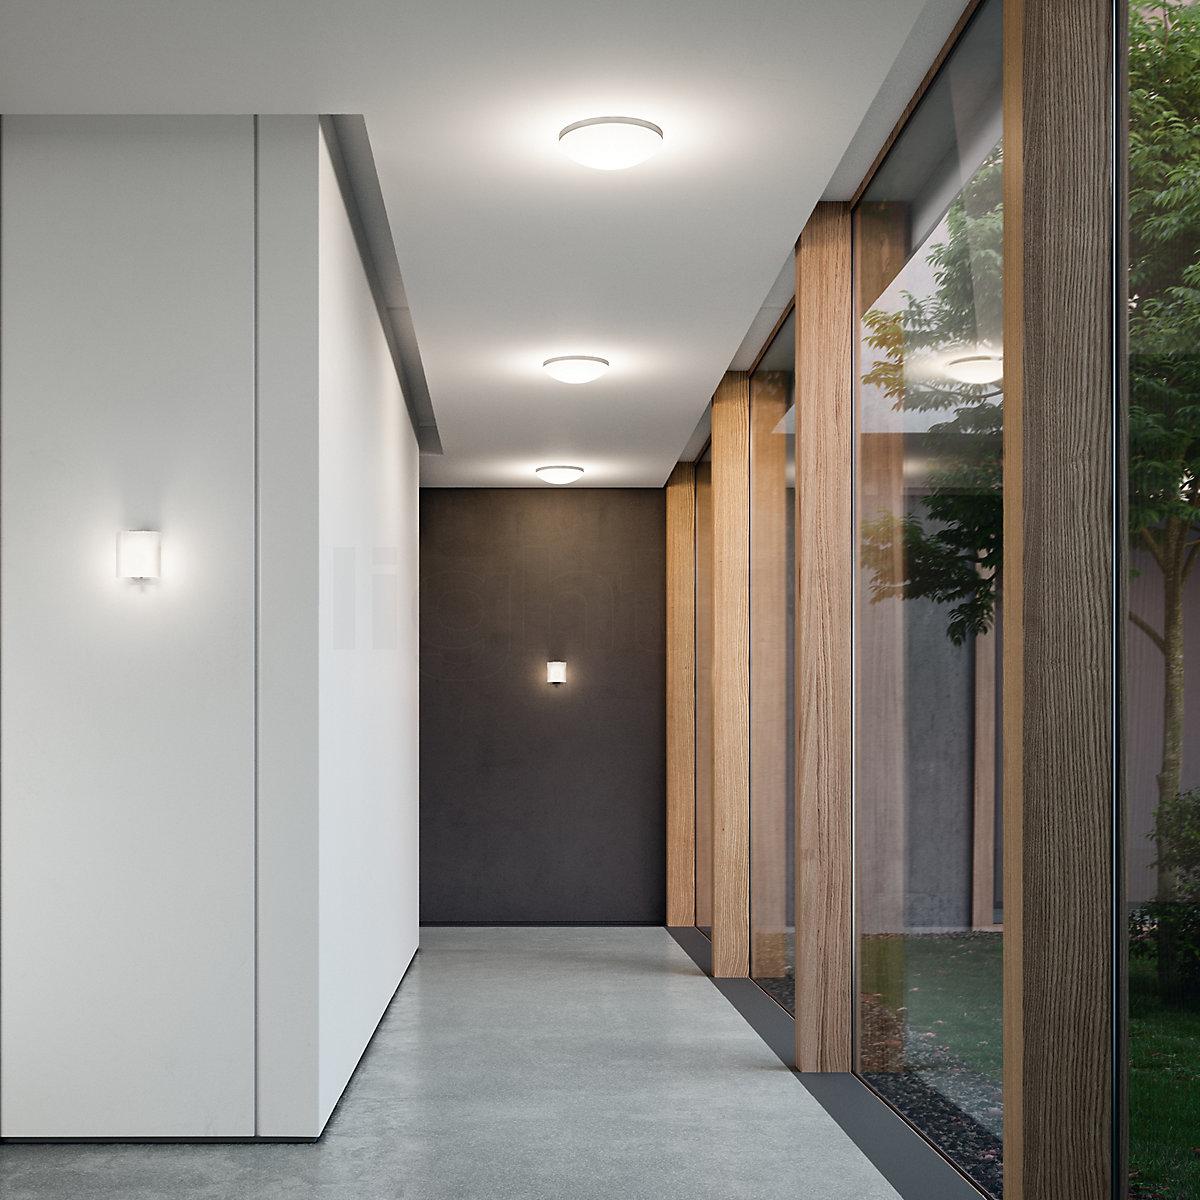 Bega Prima 12132 Decken Wandleuchte LED